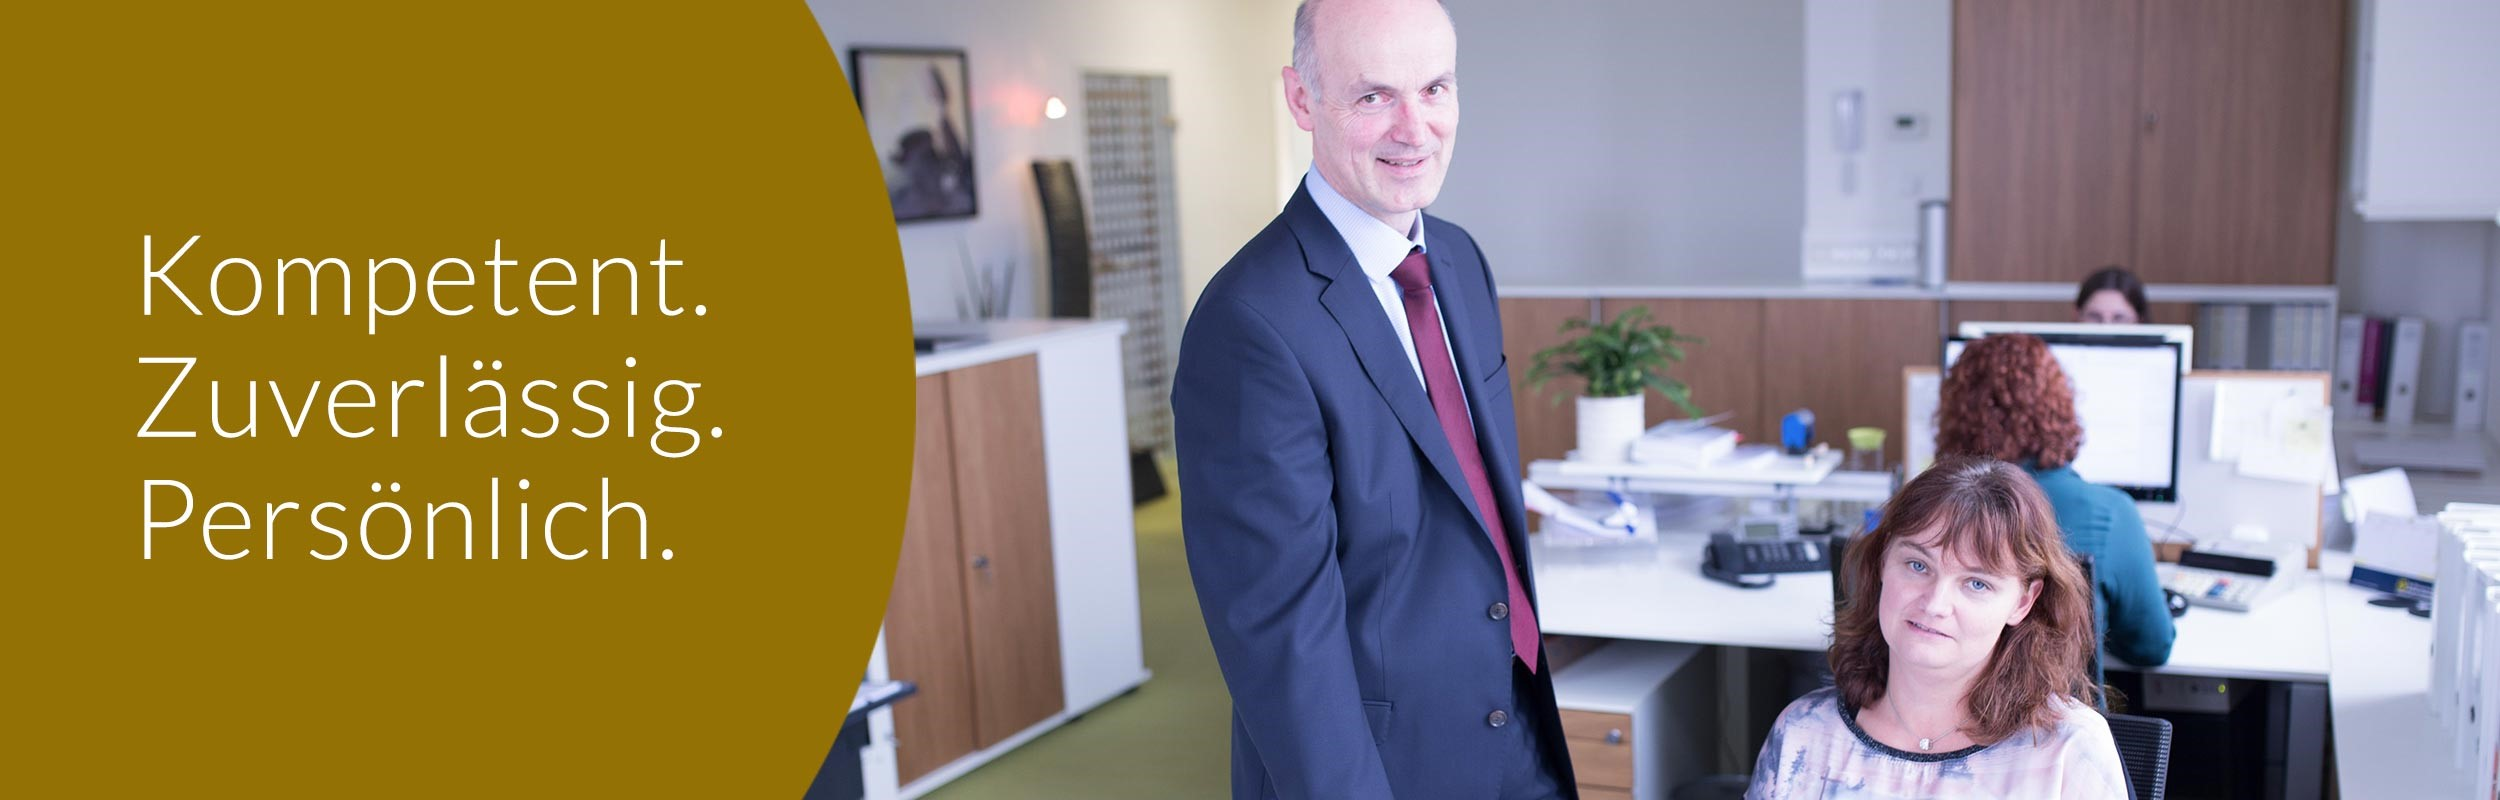 Steuerberater Mag. Herbert Stadler aus Eferding